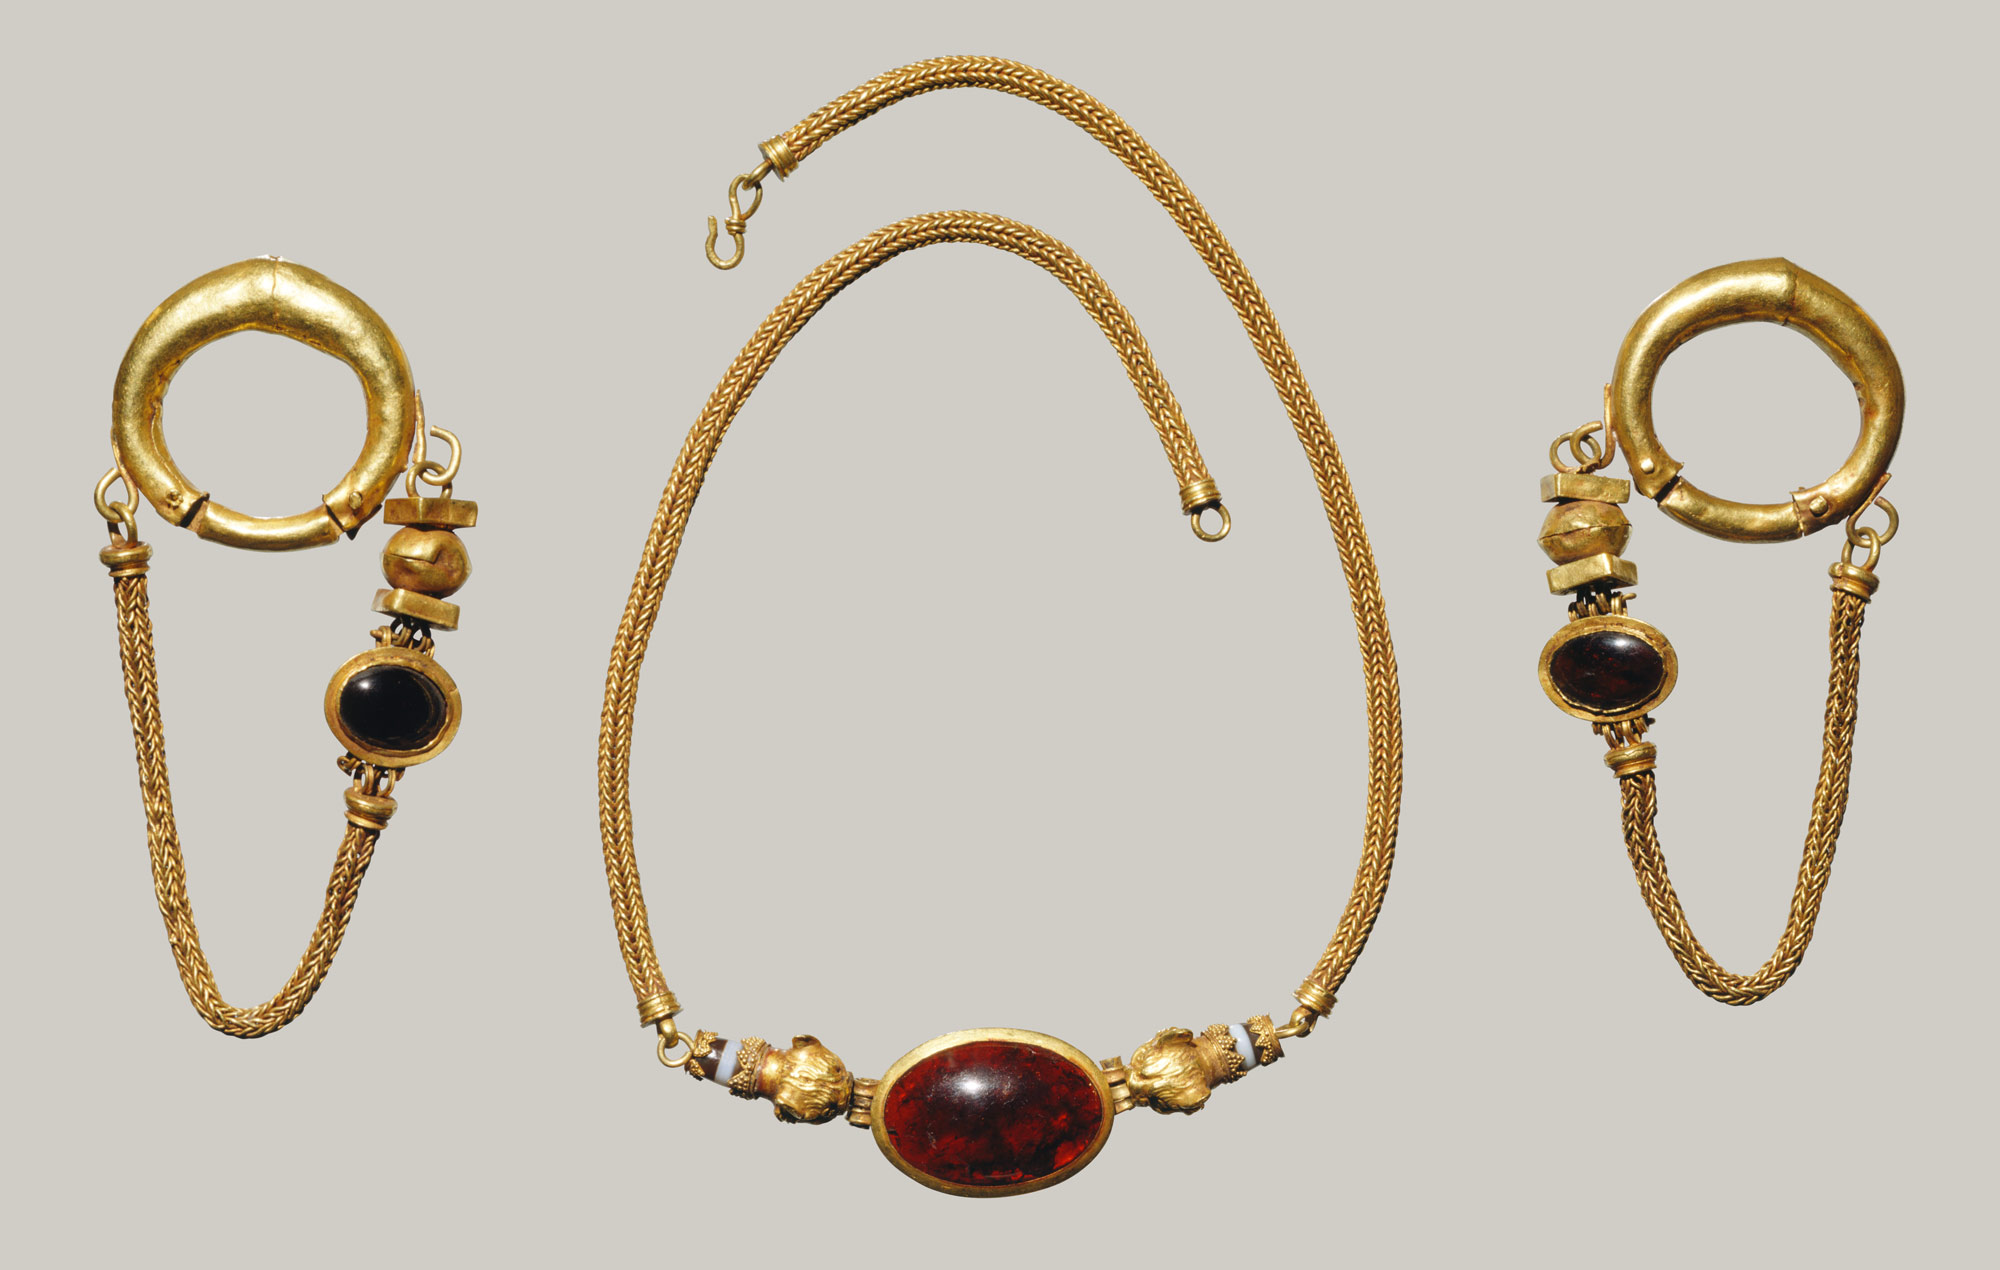 4d6e87d68 Hellenistic Jewelry | Essay | Heilbrunn Timeline of Art History ...